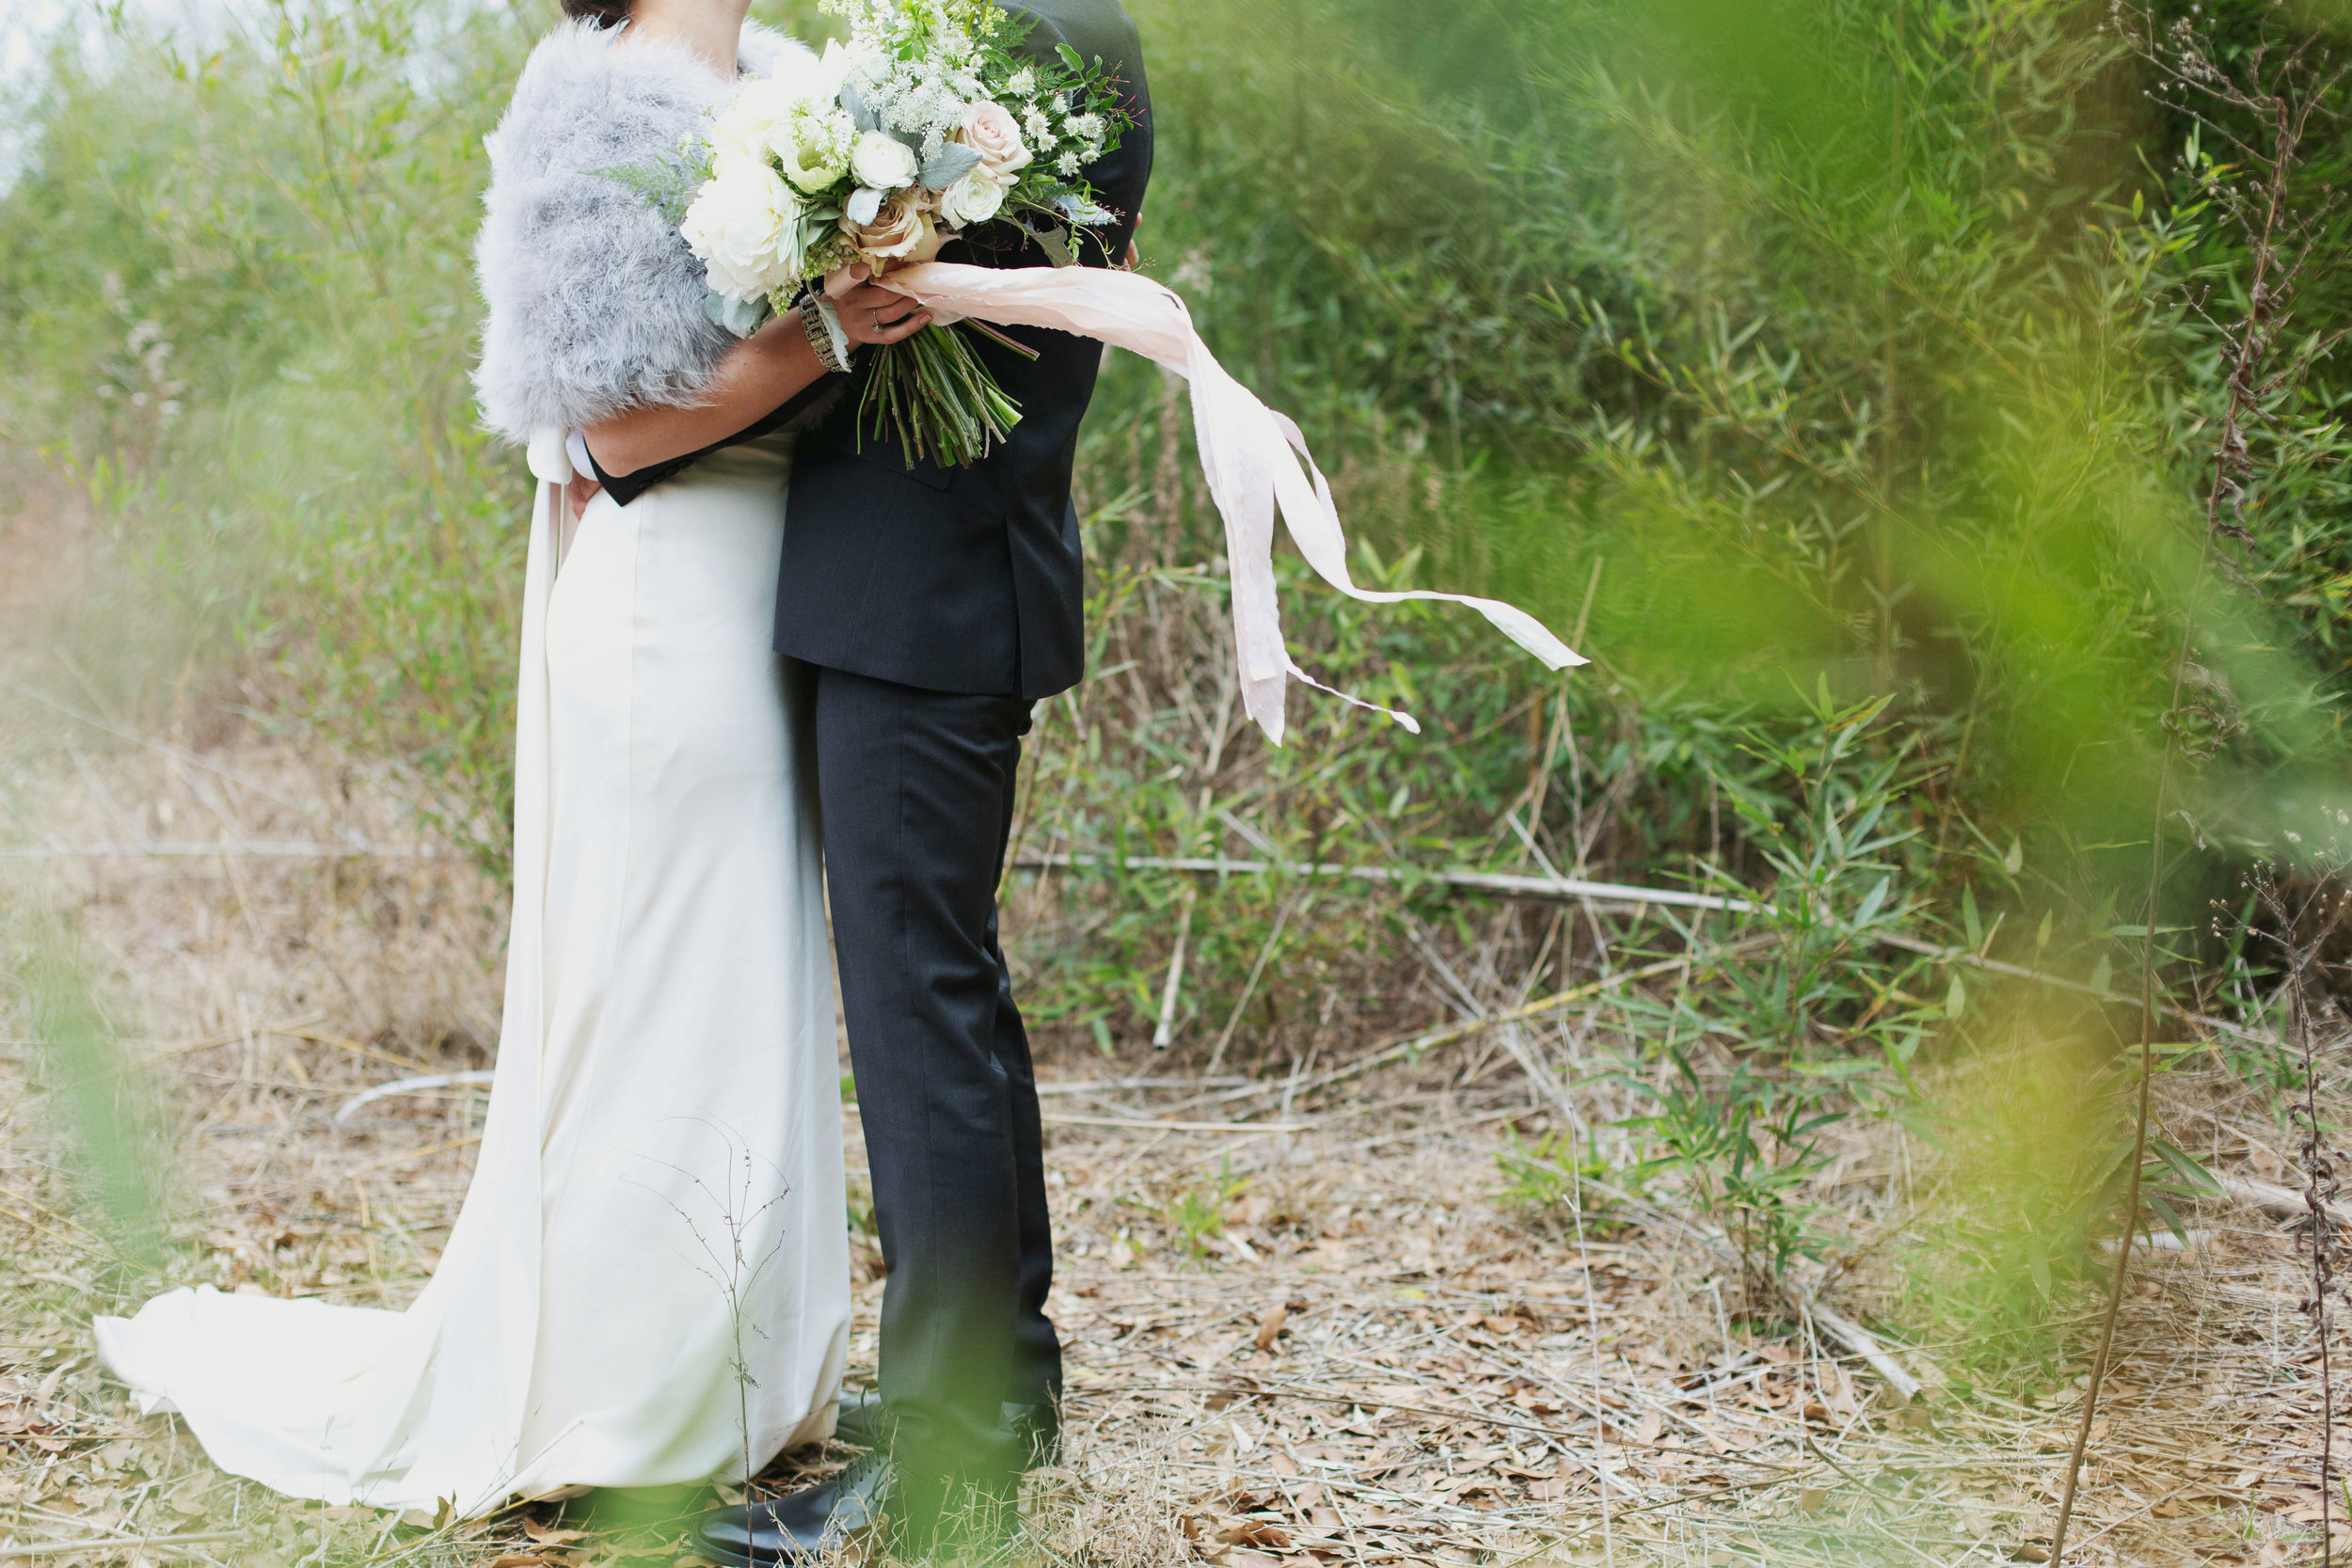 Simply-Charming-Socials_Atlanta-Wedding-Planner_Our-Labor-Of-Love_Emily-and-Jon_5.jpg